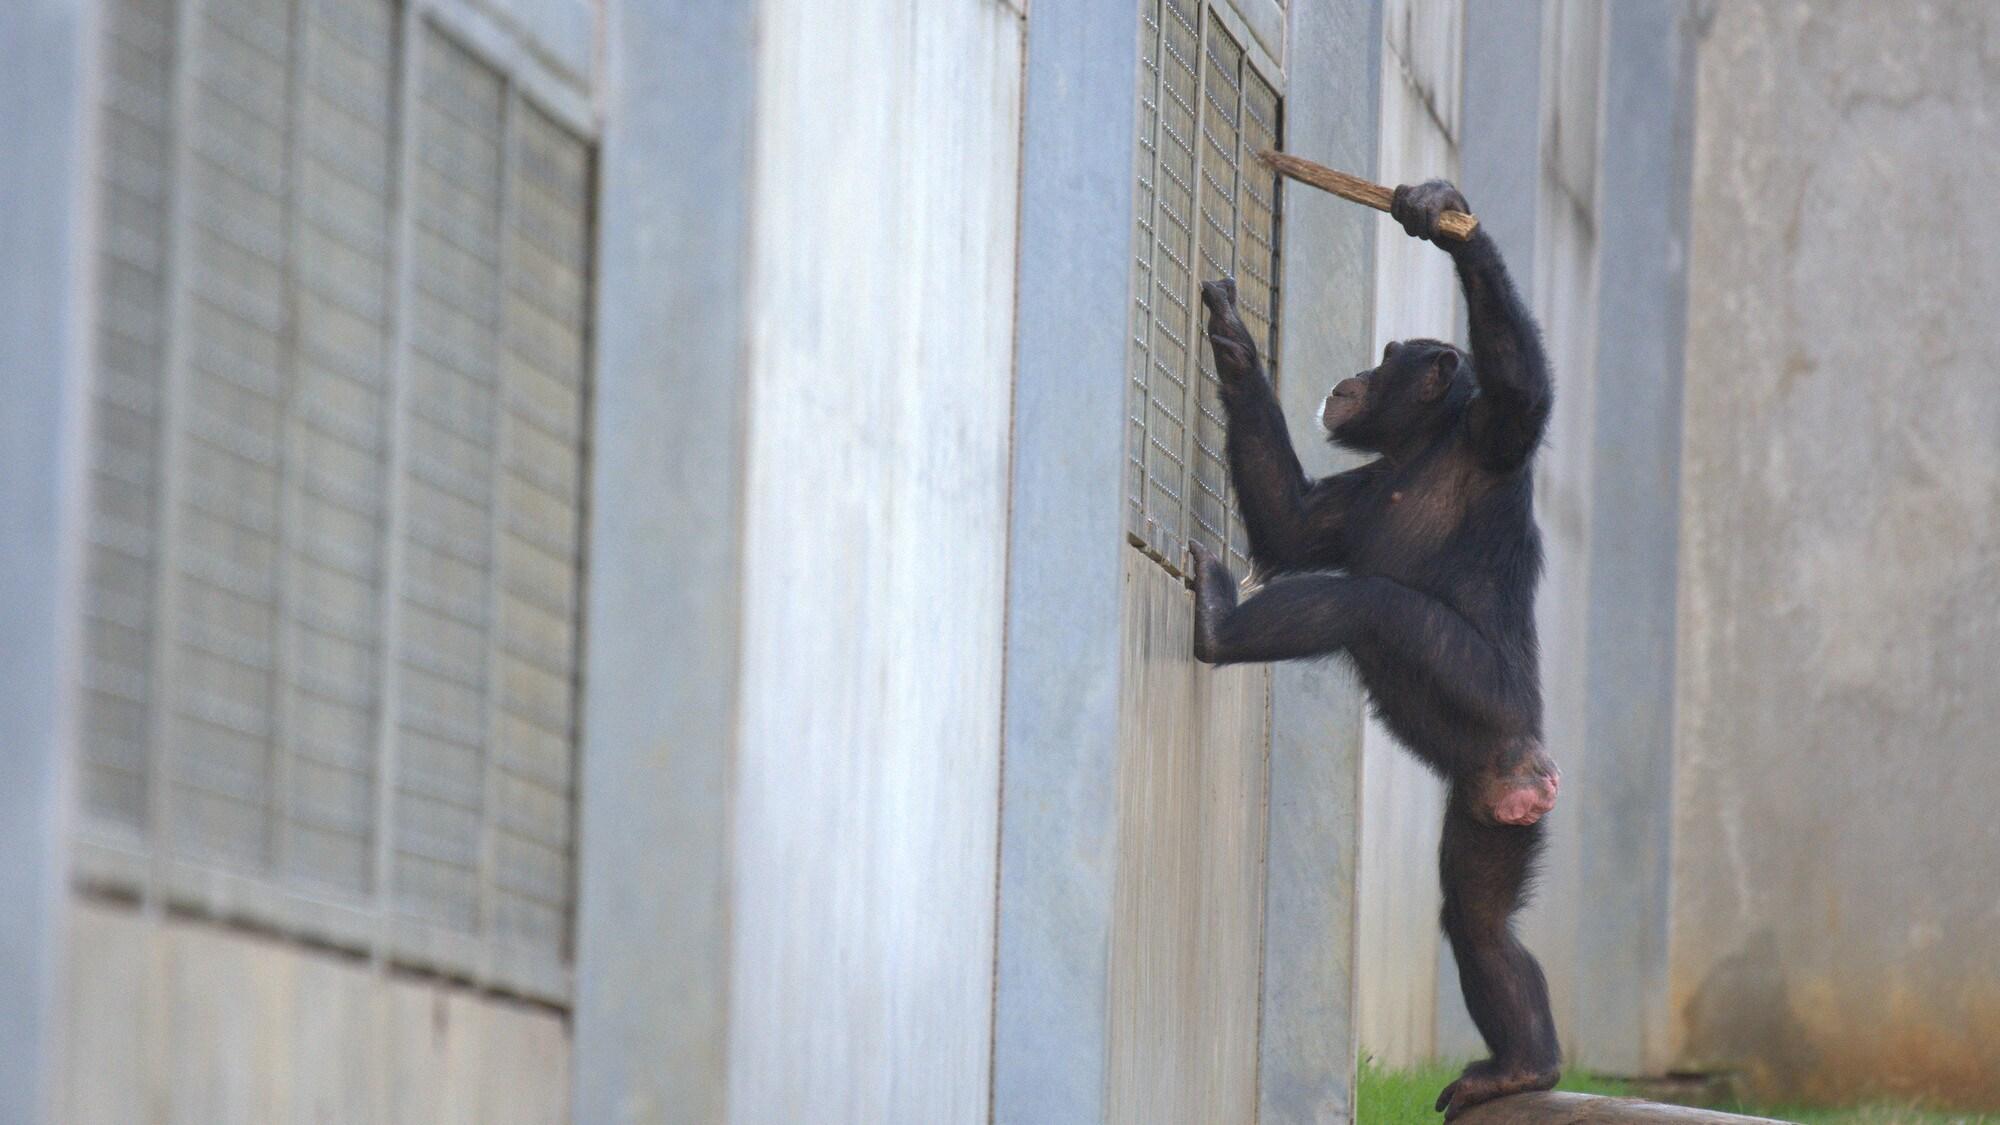 Arden poking stick through mesh. Sara Soda's group. (National Geographic/Virginia Quinn)